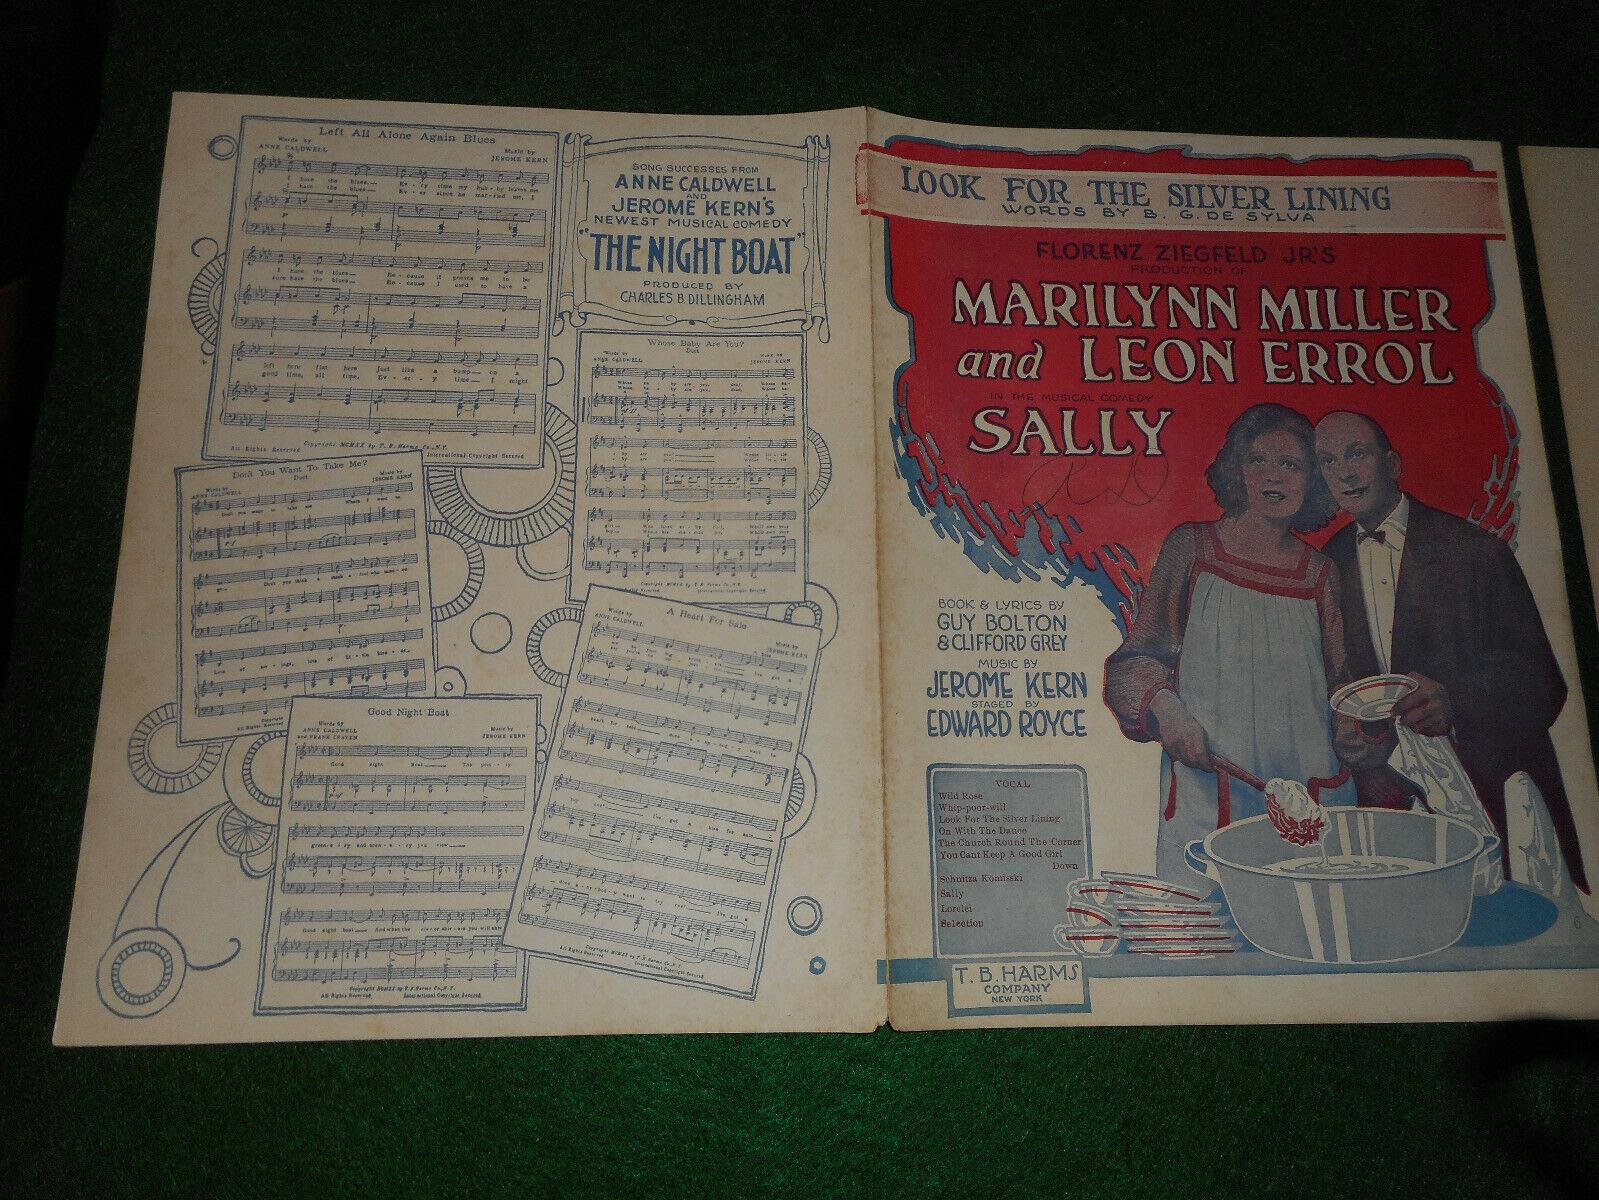 Look For The Silver Lining 1920 Marilynn Miller Leon Miller Broadway Sheet Music - $5.99